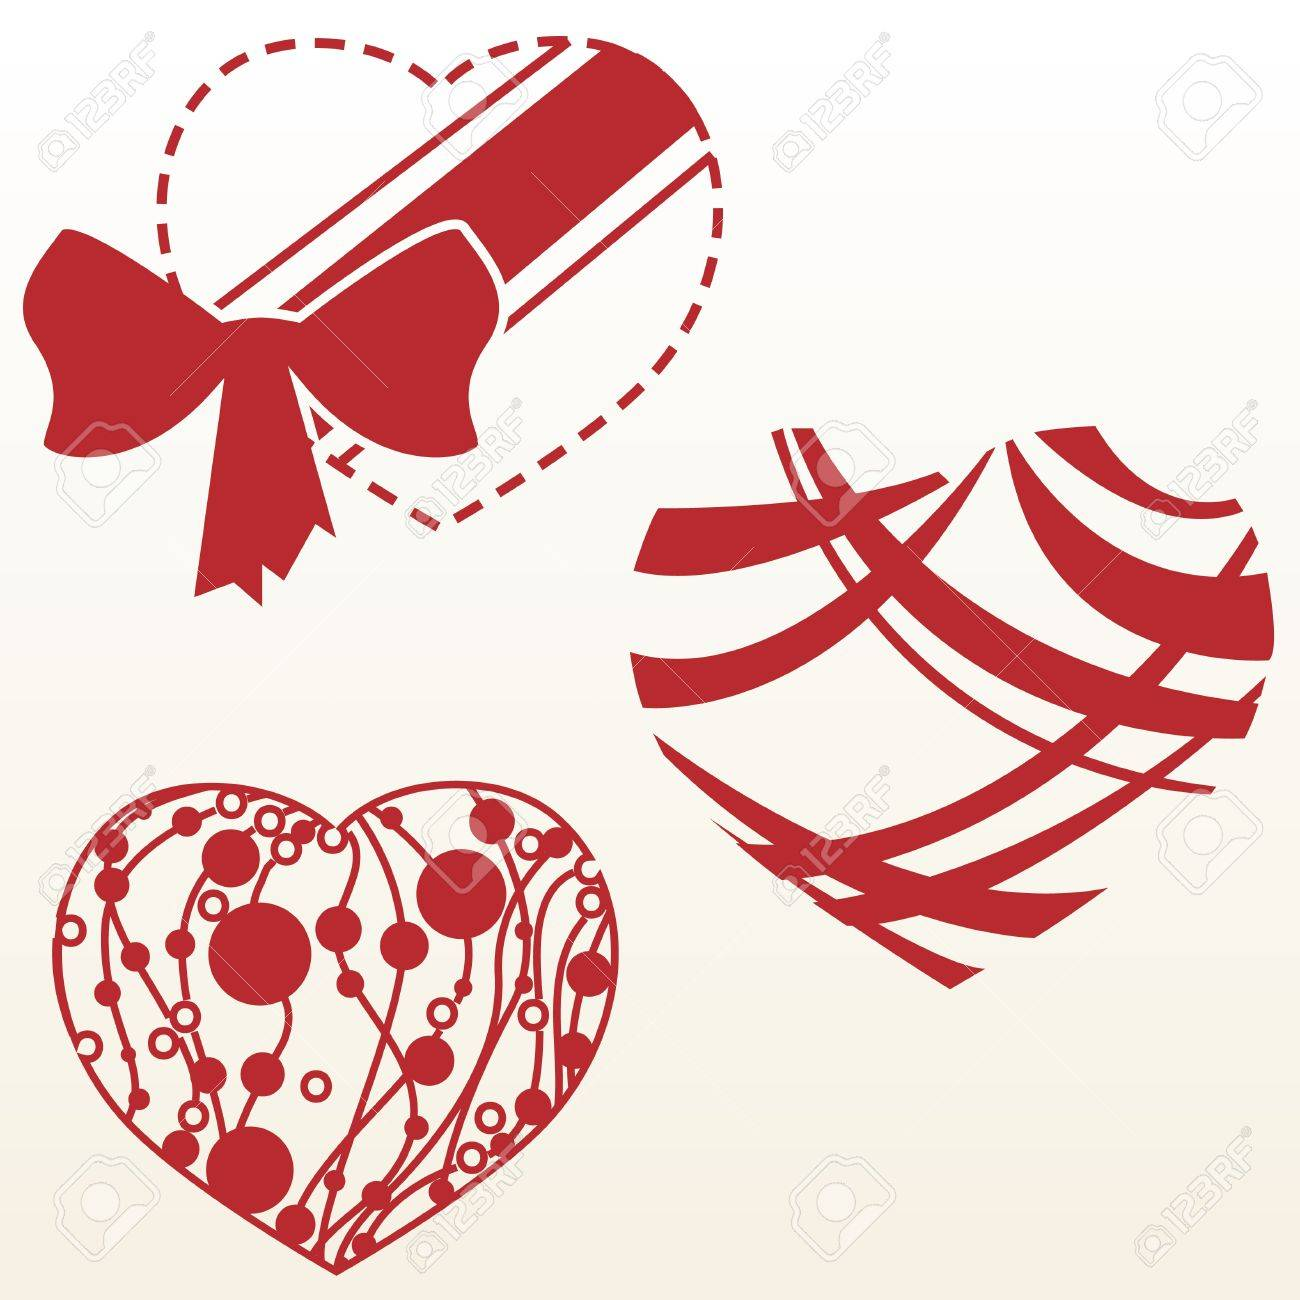 Set of three designs of heart shape Stock Vector - 12495872